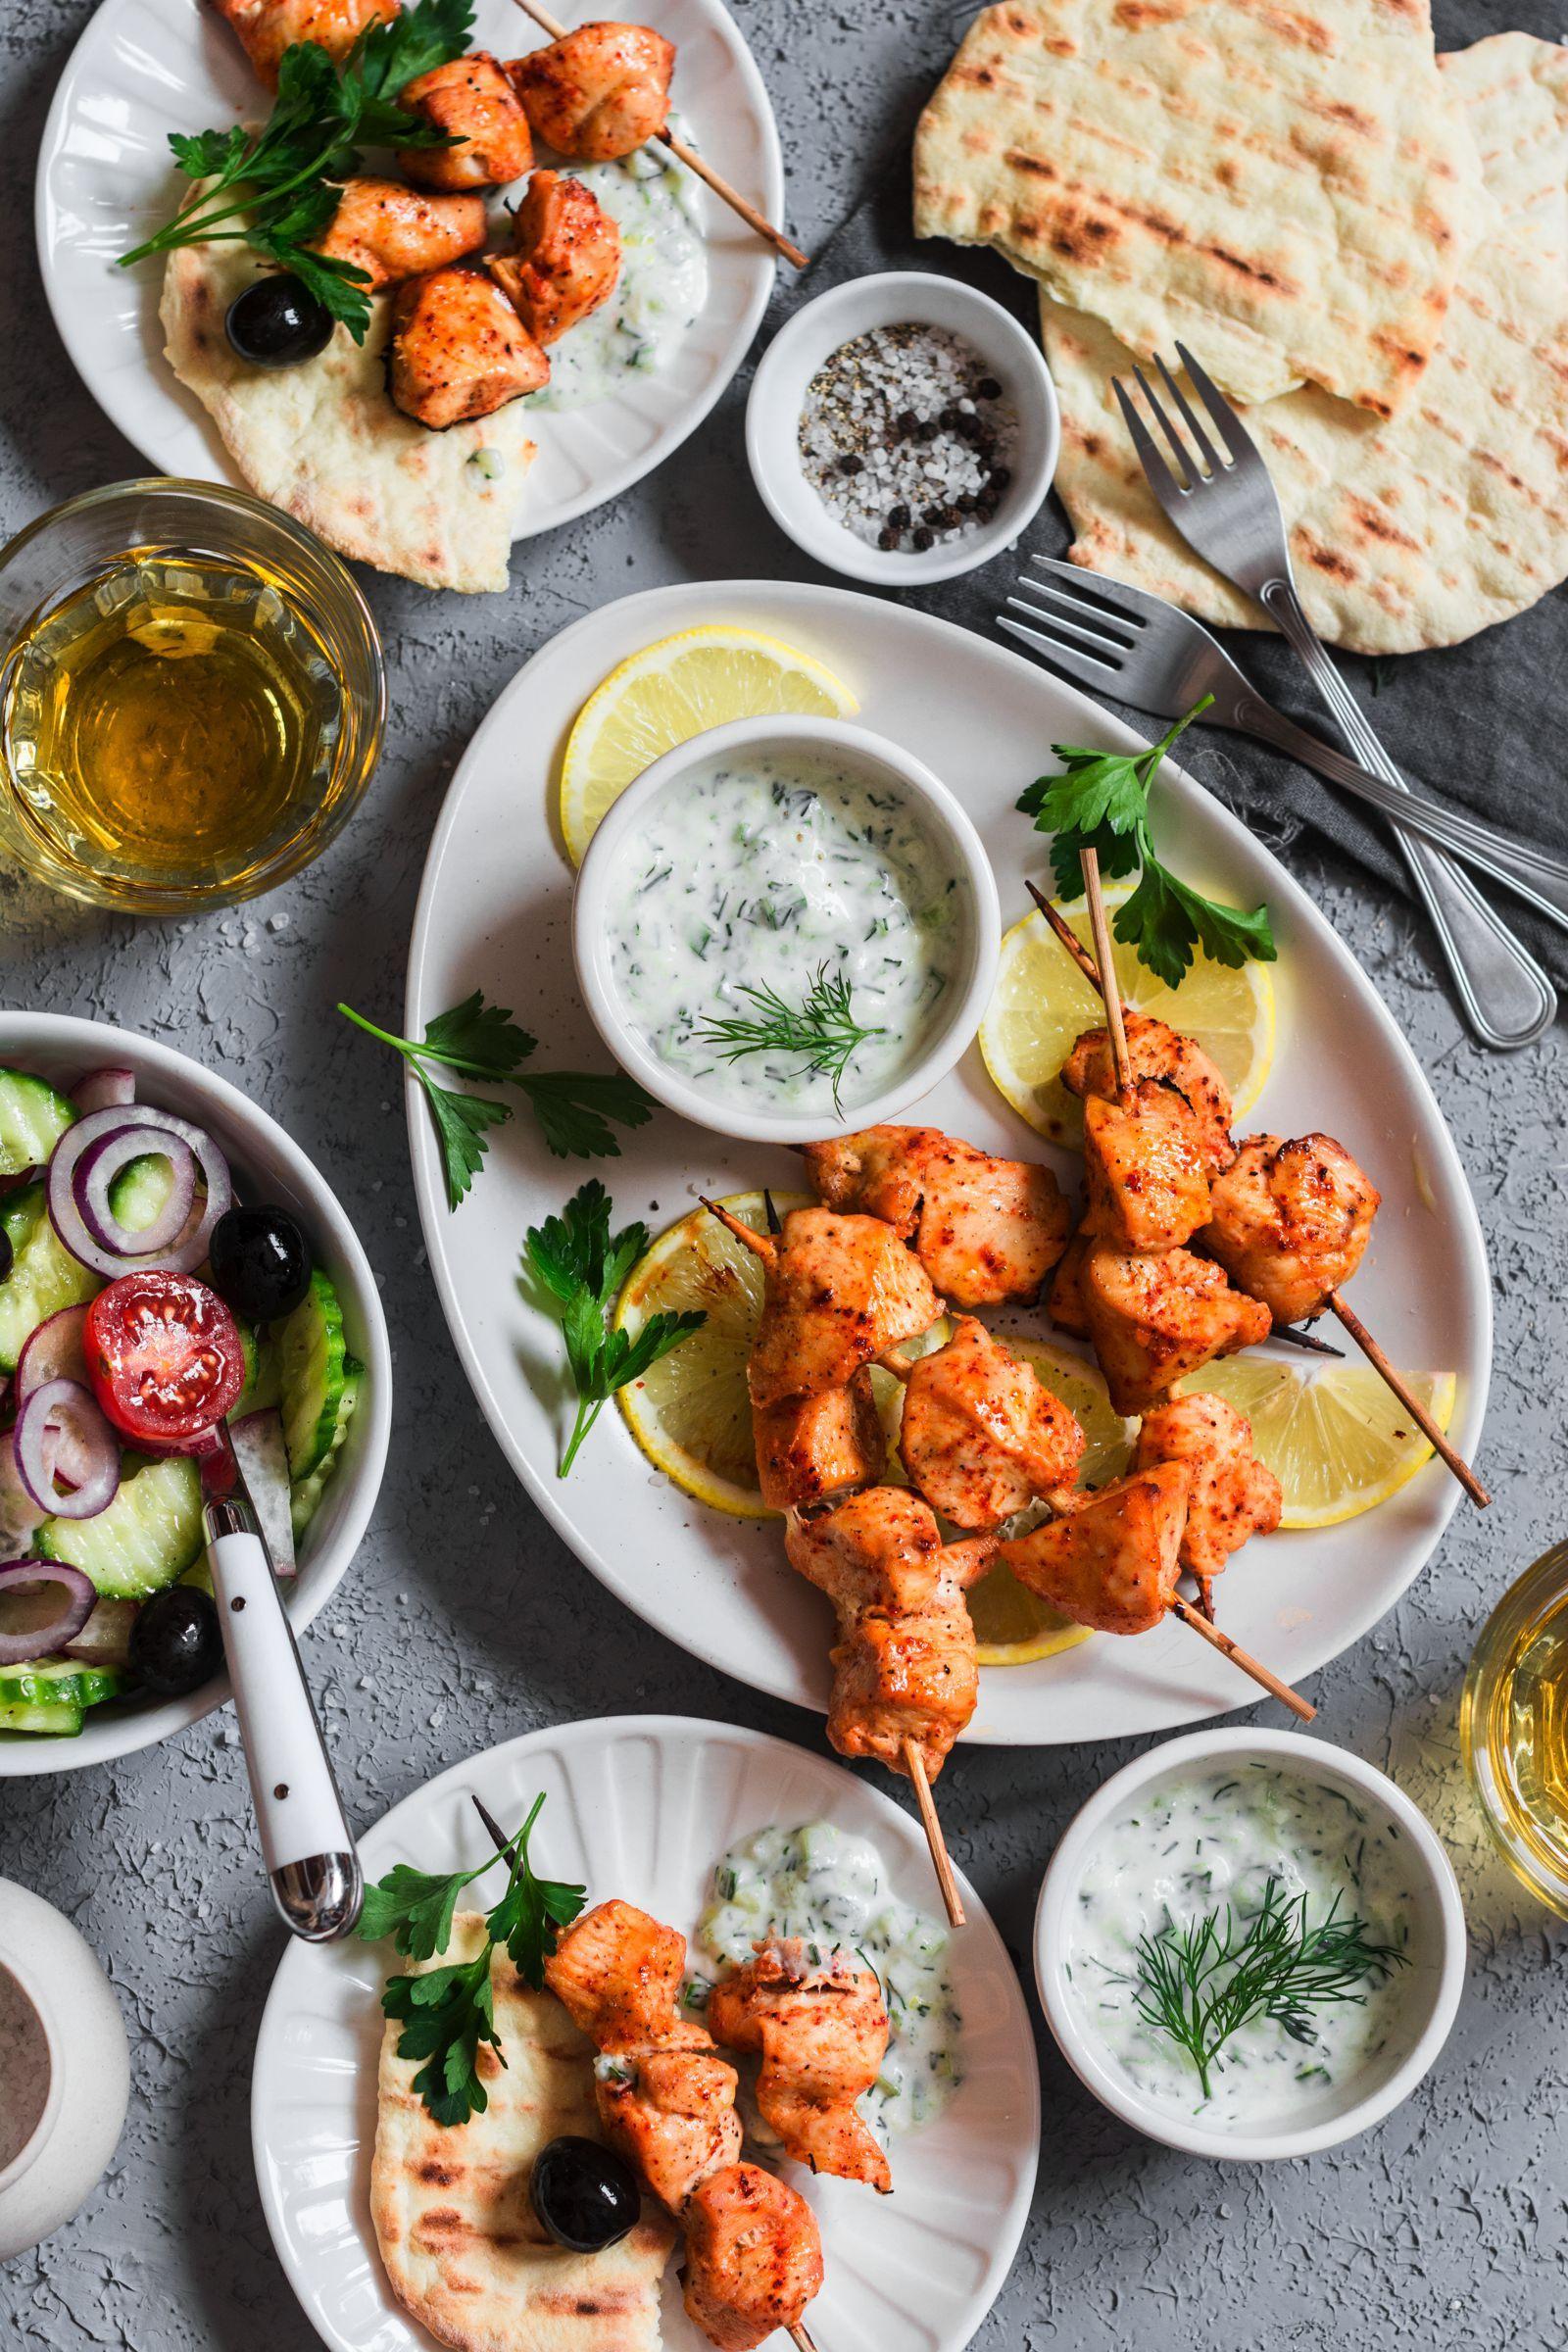 12 Best Greek Foods To Try In Greece Greek Recipes Food Drink Photography Greece Food